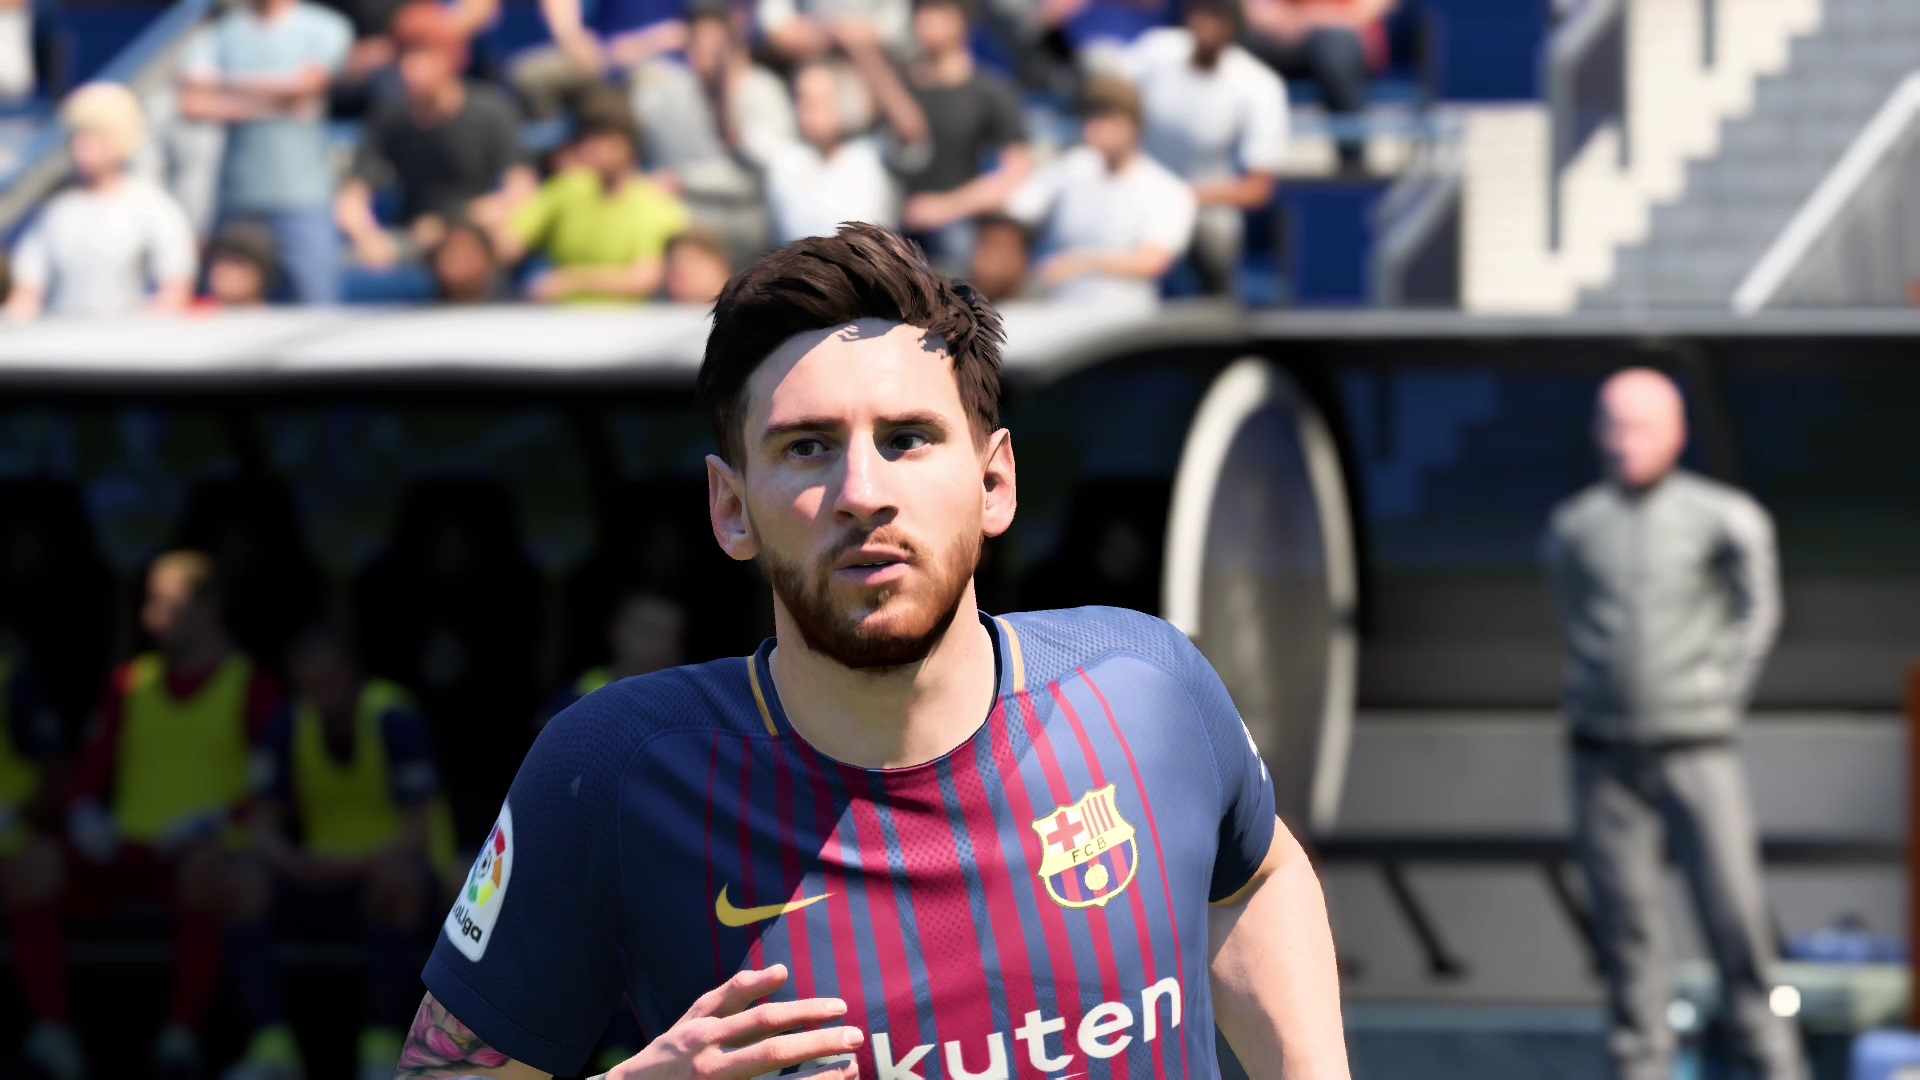 Fifa 19 Alles Zu Release Preis Cover Star The Journey Und 18 Ps4 Messi